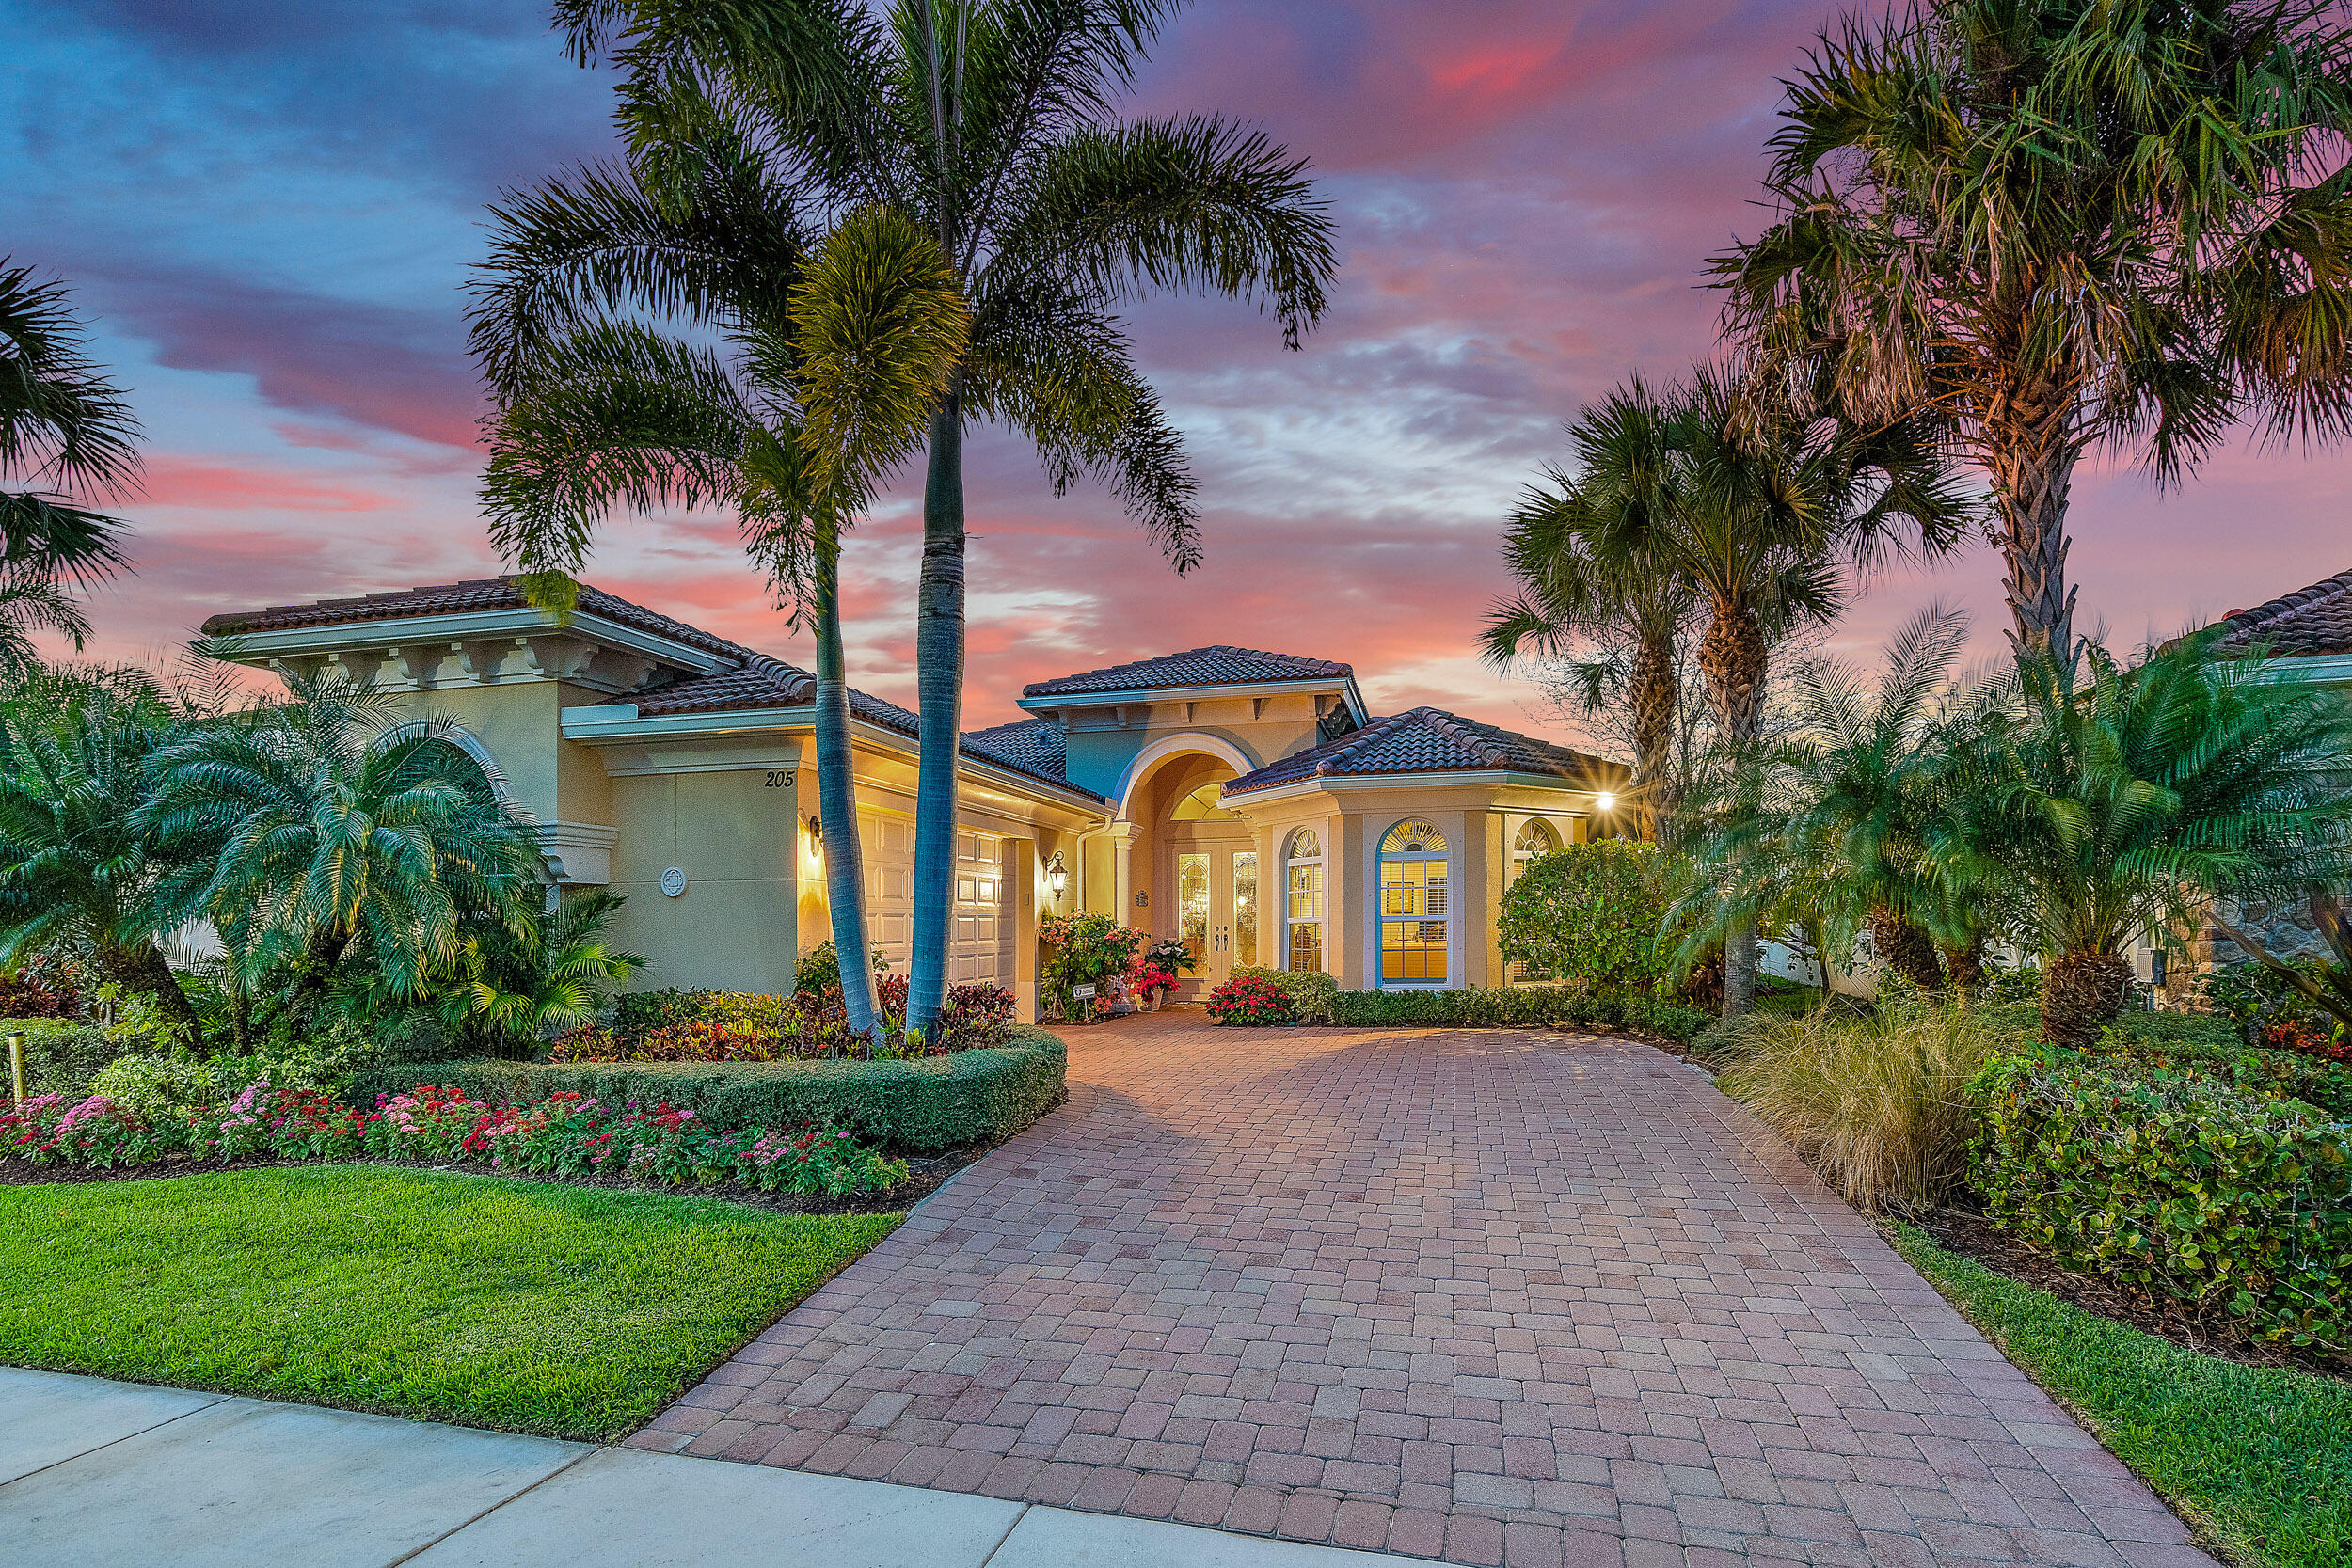 205 Carina Drive, Jupiter, Florida 33478, 3 Bedrooms Bedrooms, ,2.1 BathroomsBathrooms,A,Single family,Carina,RX-10698404